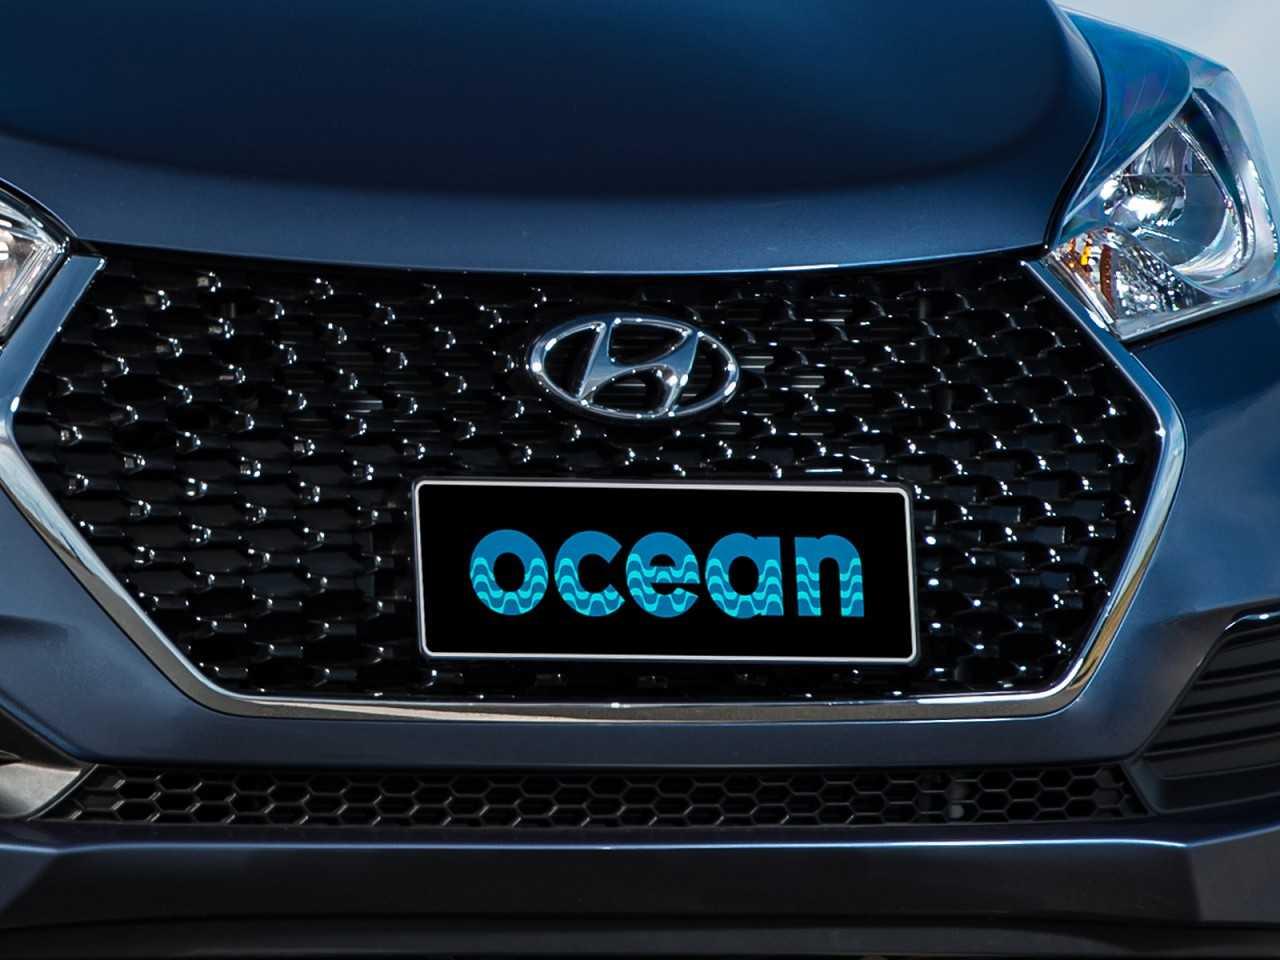 HyundaiHB20S 2017 - grade frontal